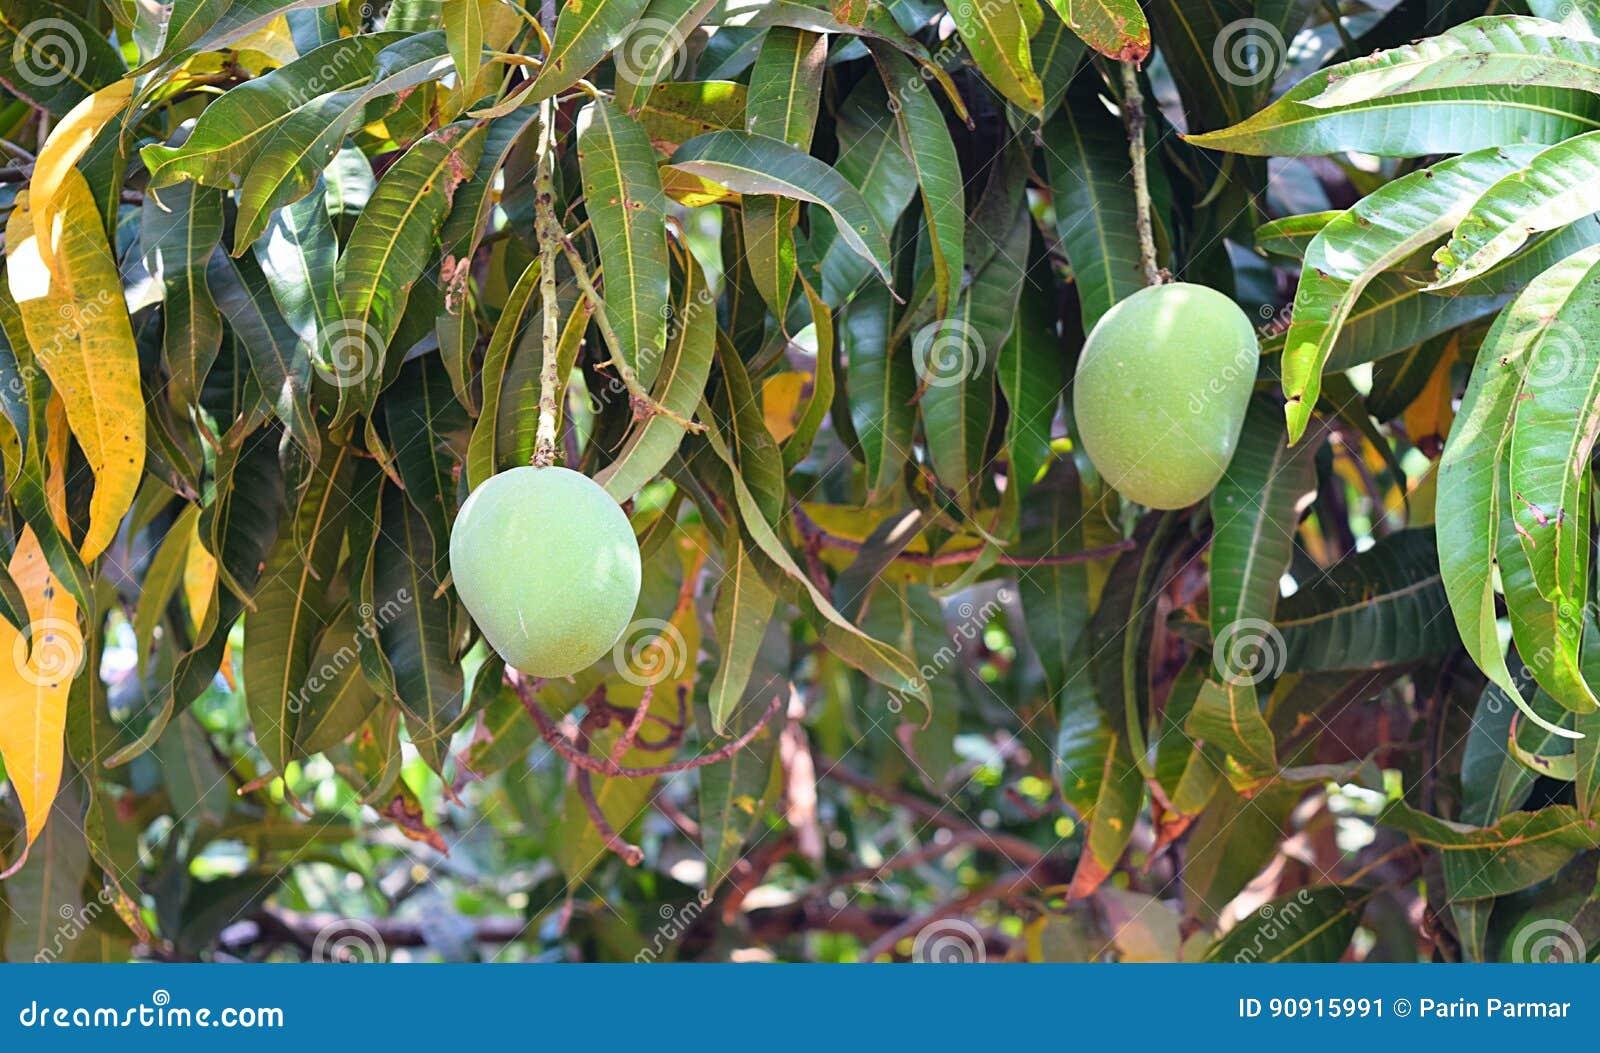 how to grow alphonso mango tree